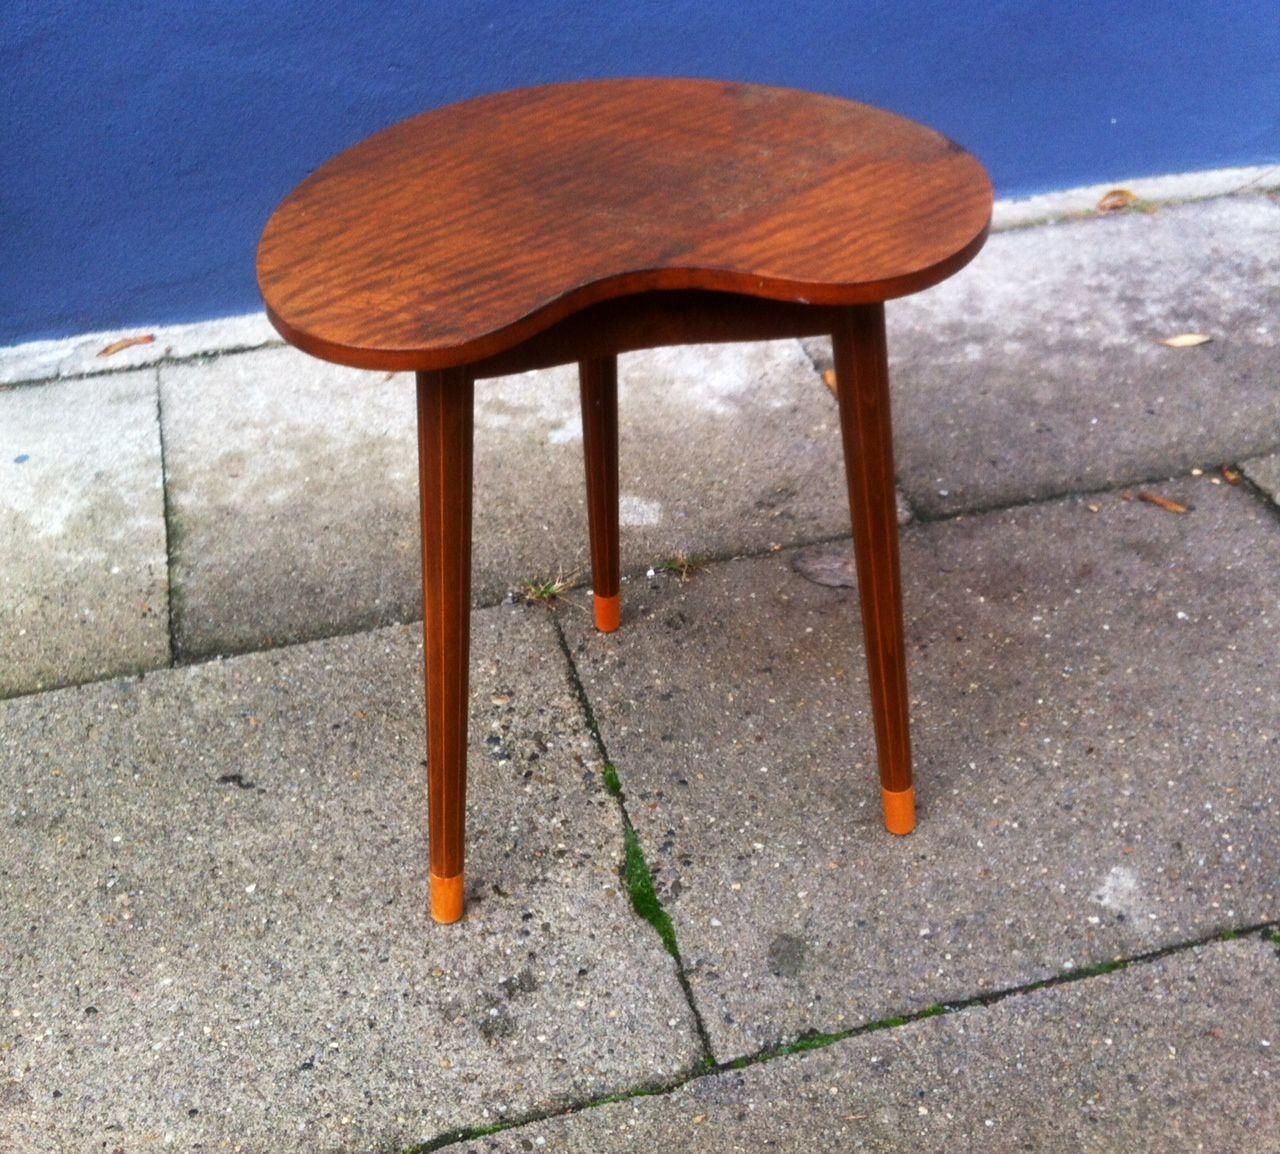 Danish Kidney Shaped Oak Side Table by Edmund Jorgensen 1950s for